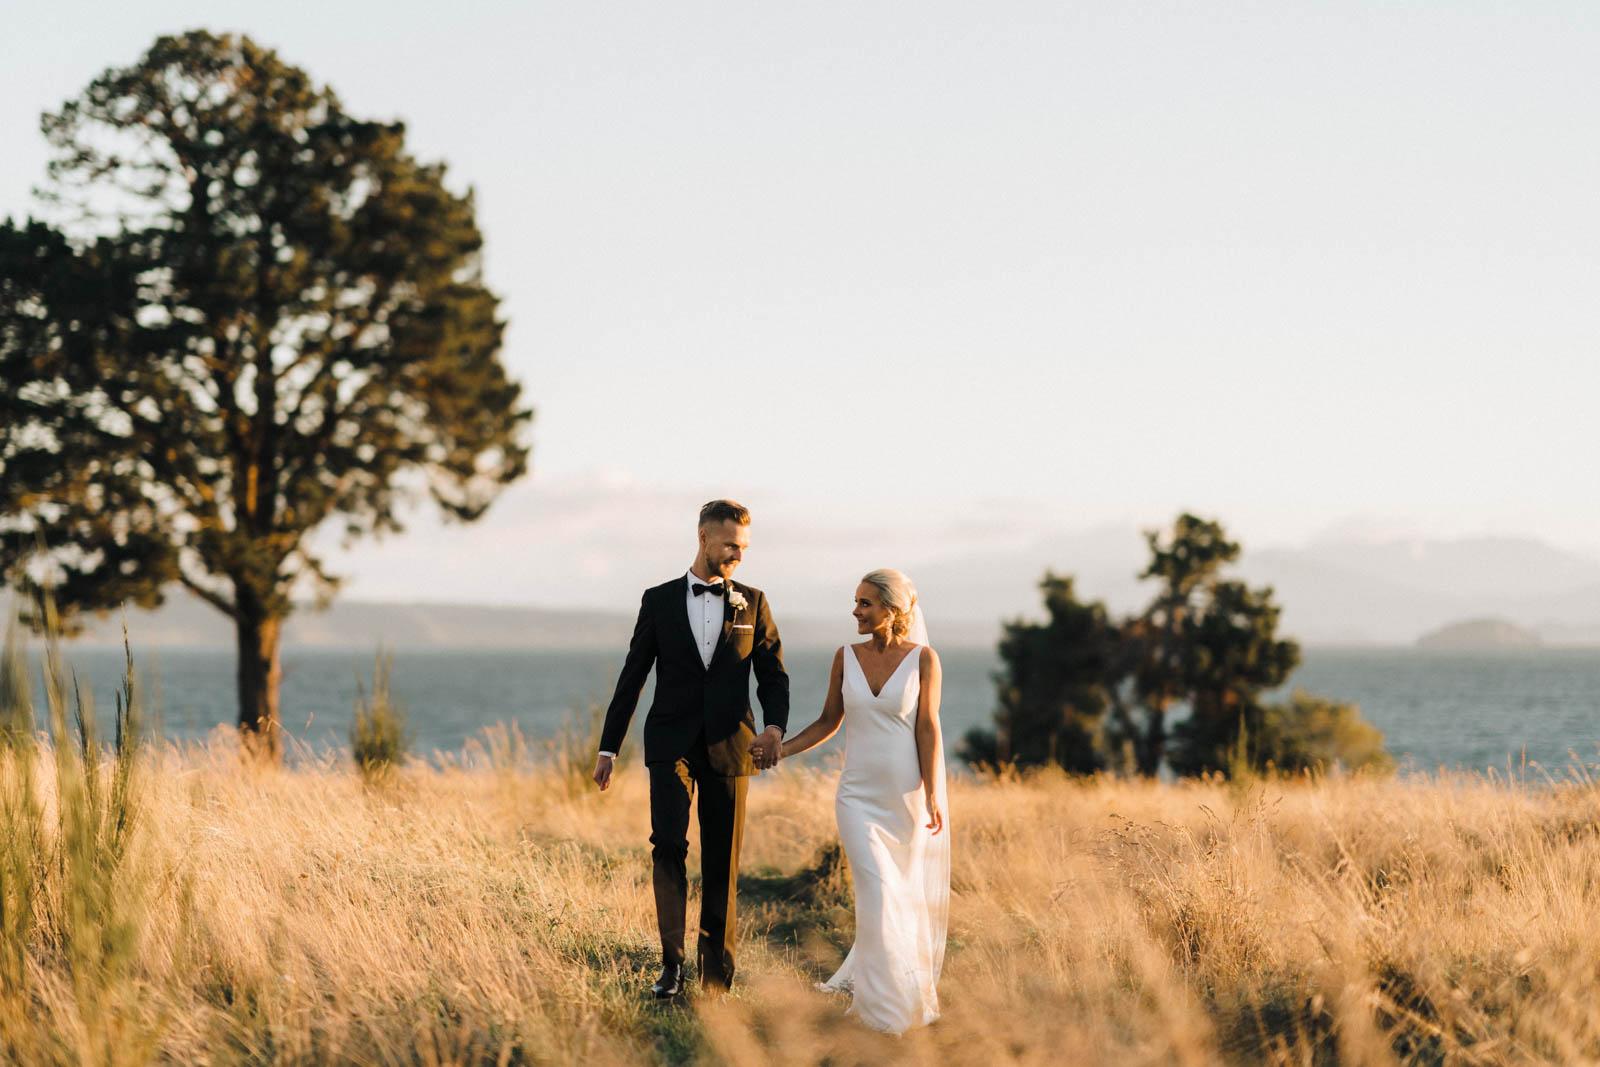 newfound-k-s-hilton-taupo-wedding-photographer-082